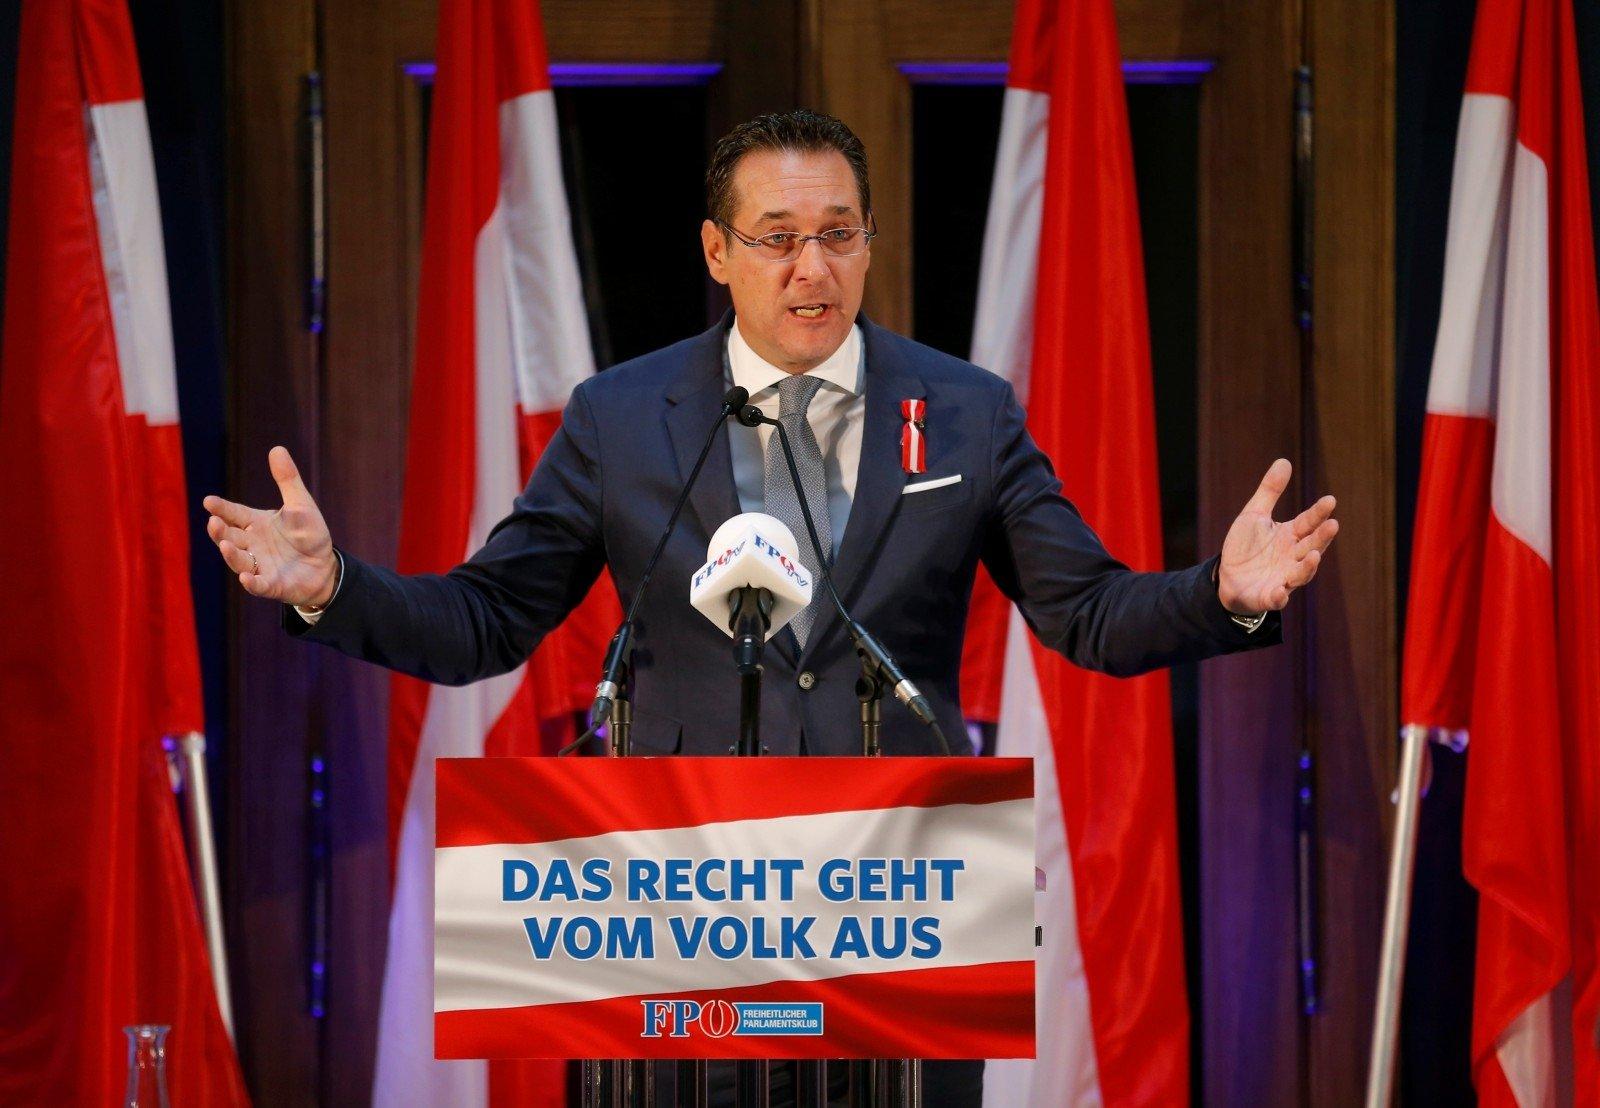 ВАвстрийской партии свободы посоветовали альтернативу антироссийским санкциям